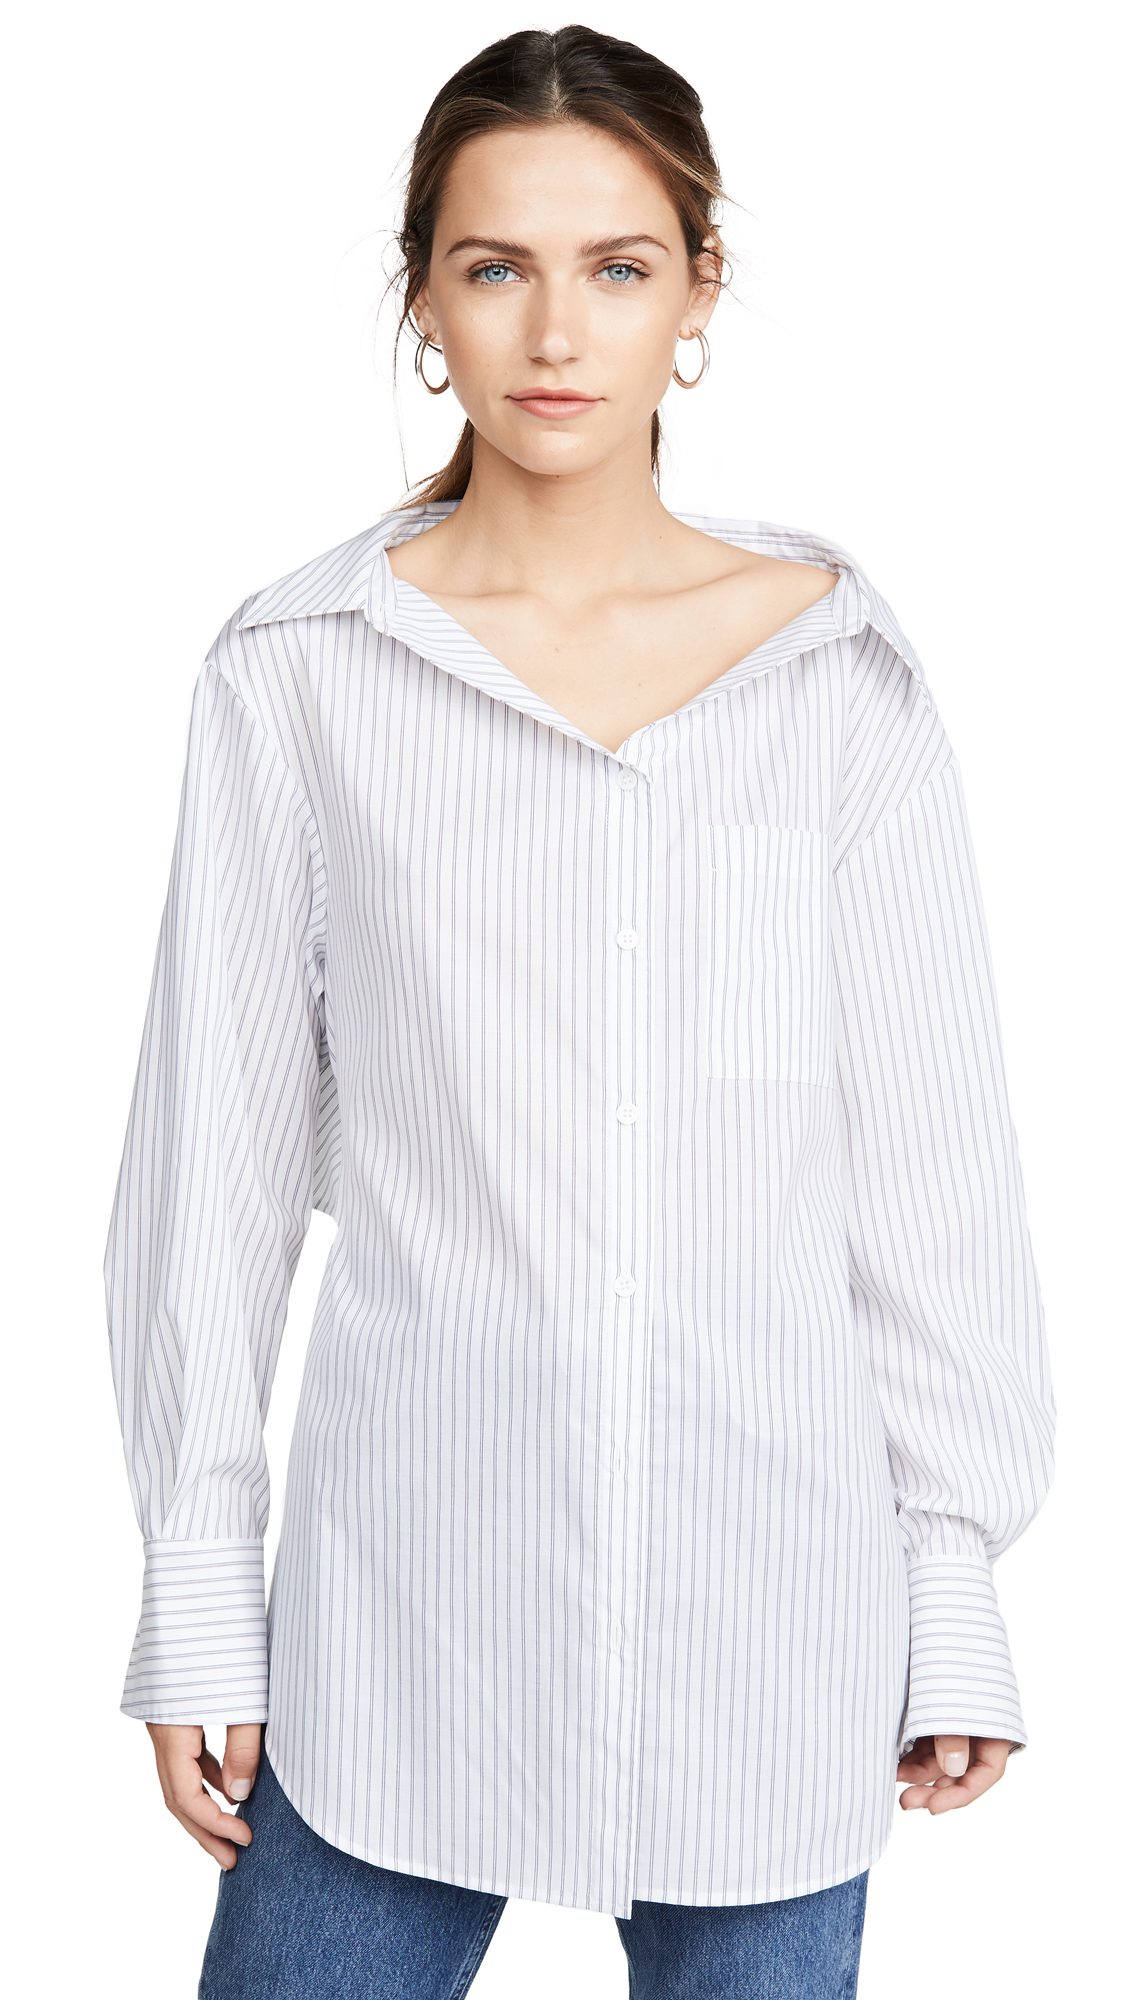 Adeam Ruched Parachute Shirt - White